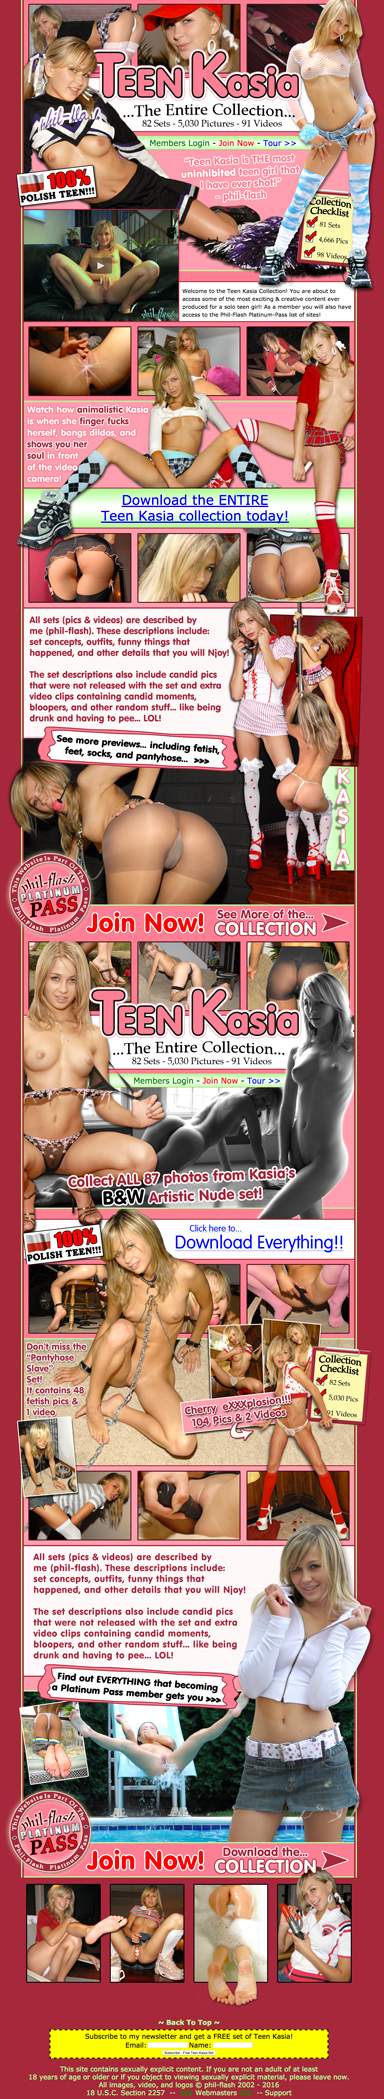 TeenKasia.com Screen Shot